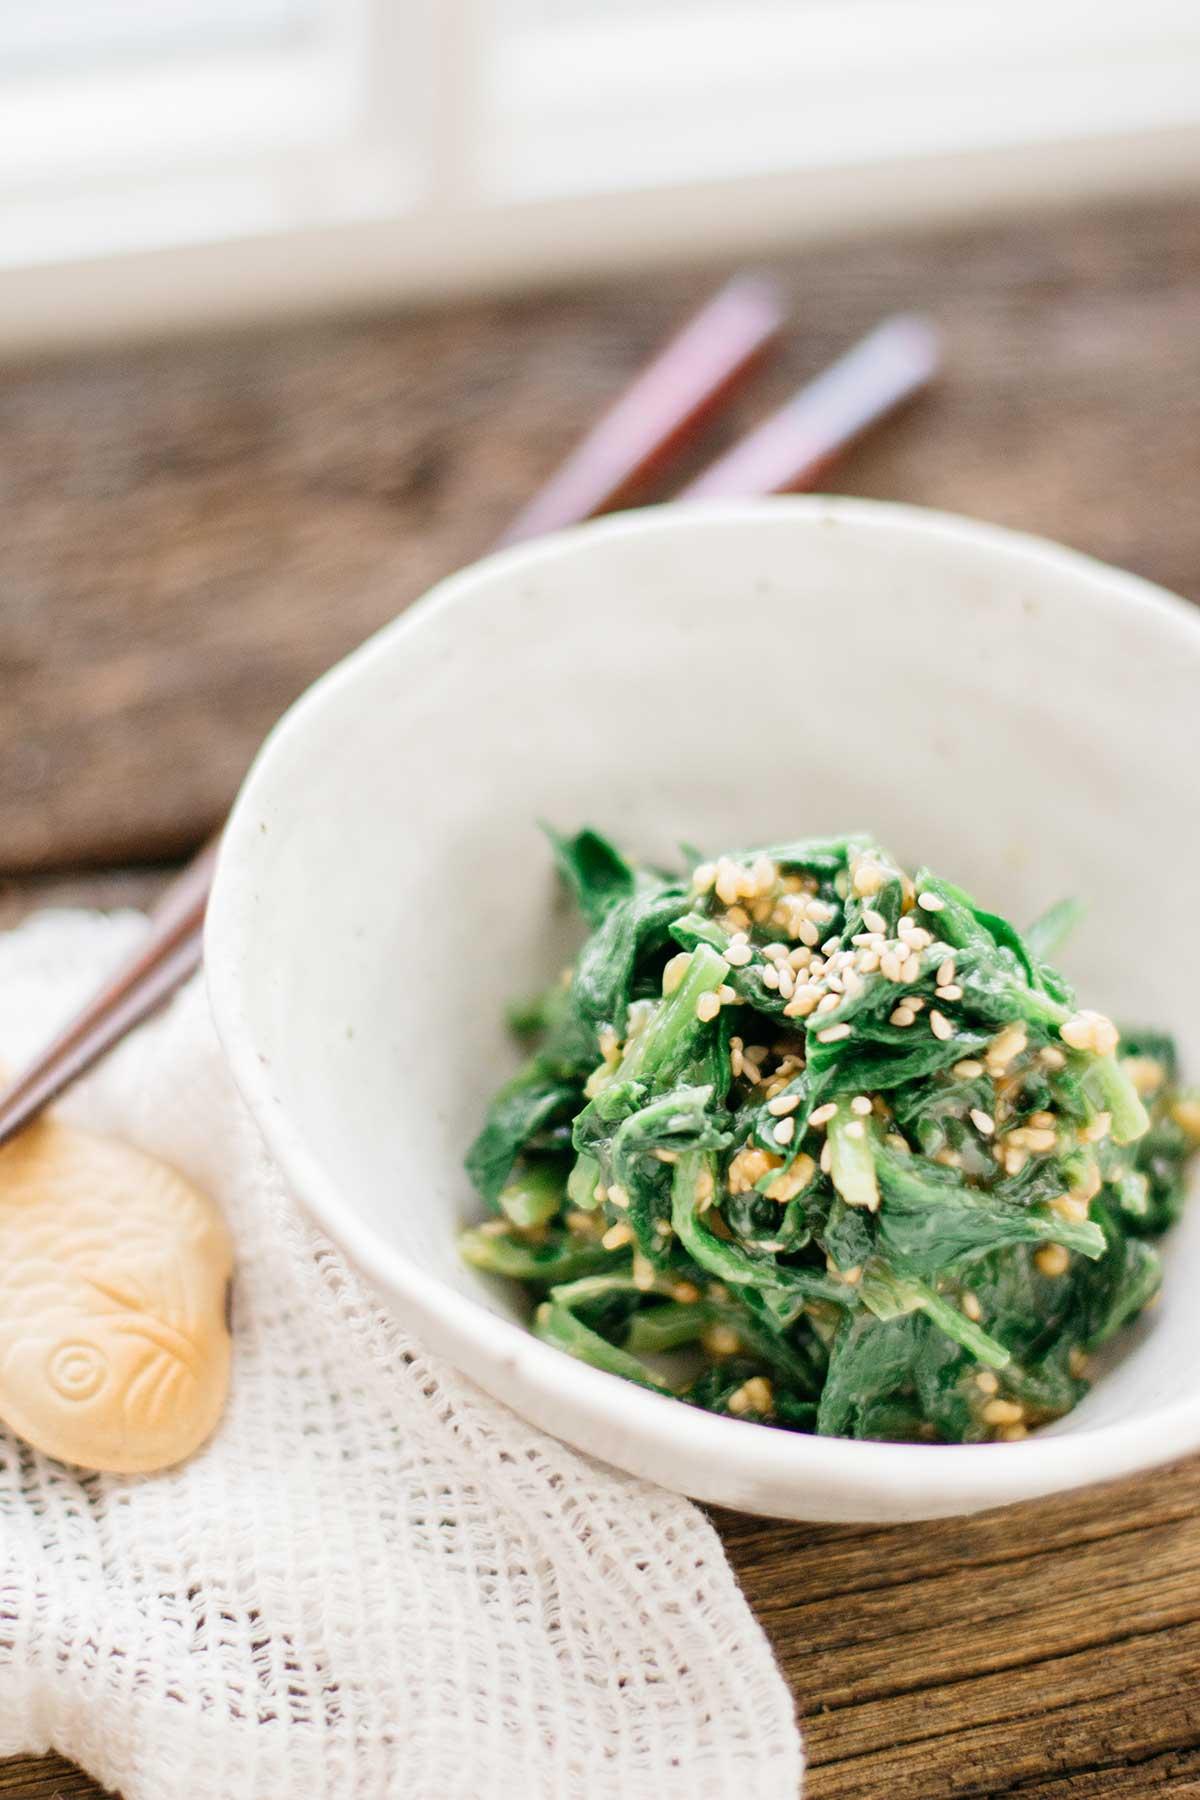 Spinach Gomaae